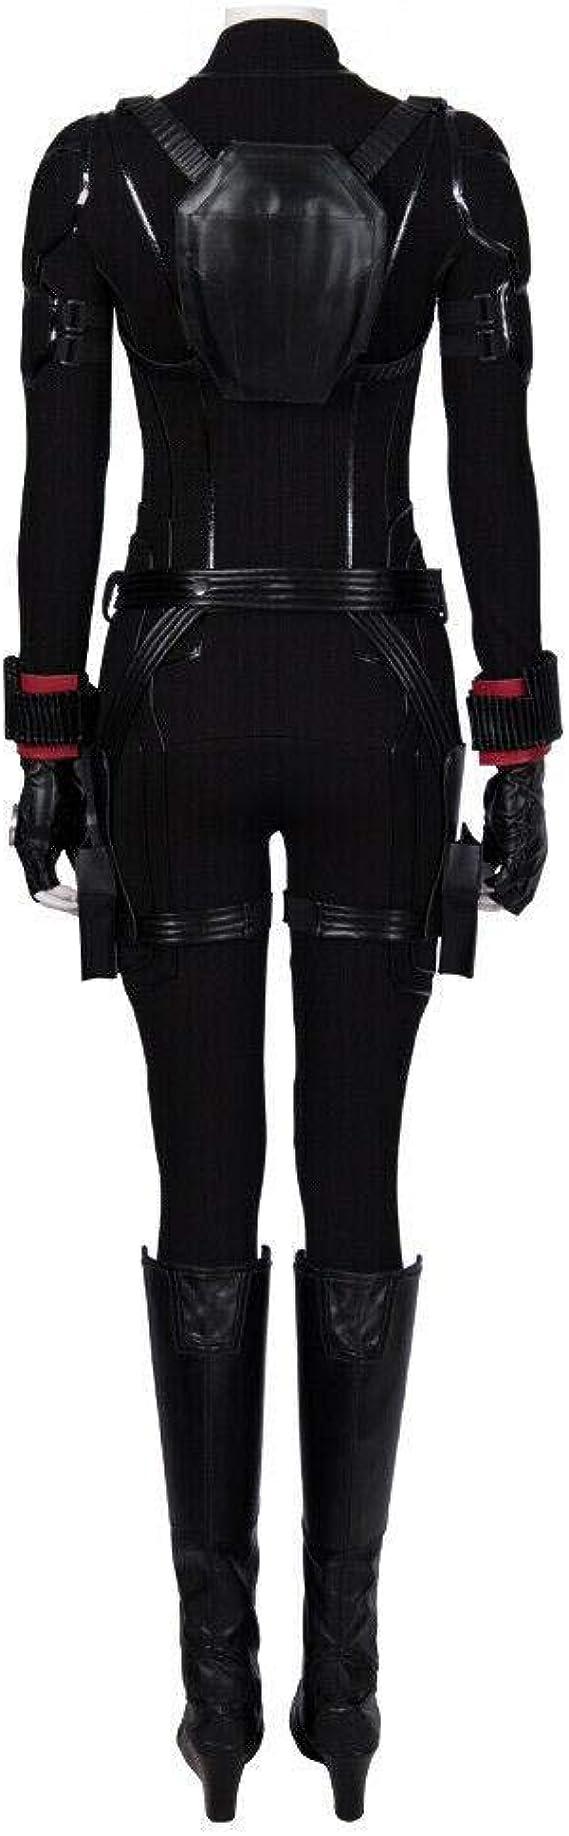 Glam Cos Disfraz de Viuda Negra para Cosplay de Avengers: Endgame ...